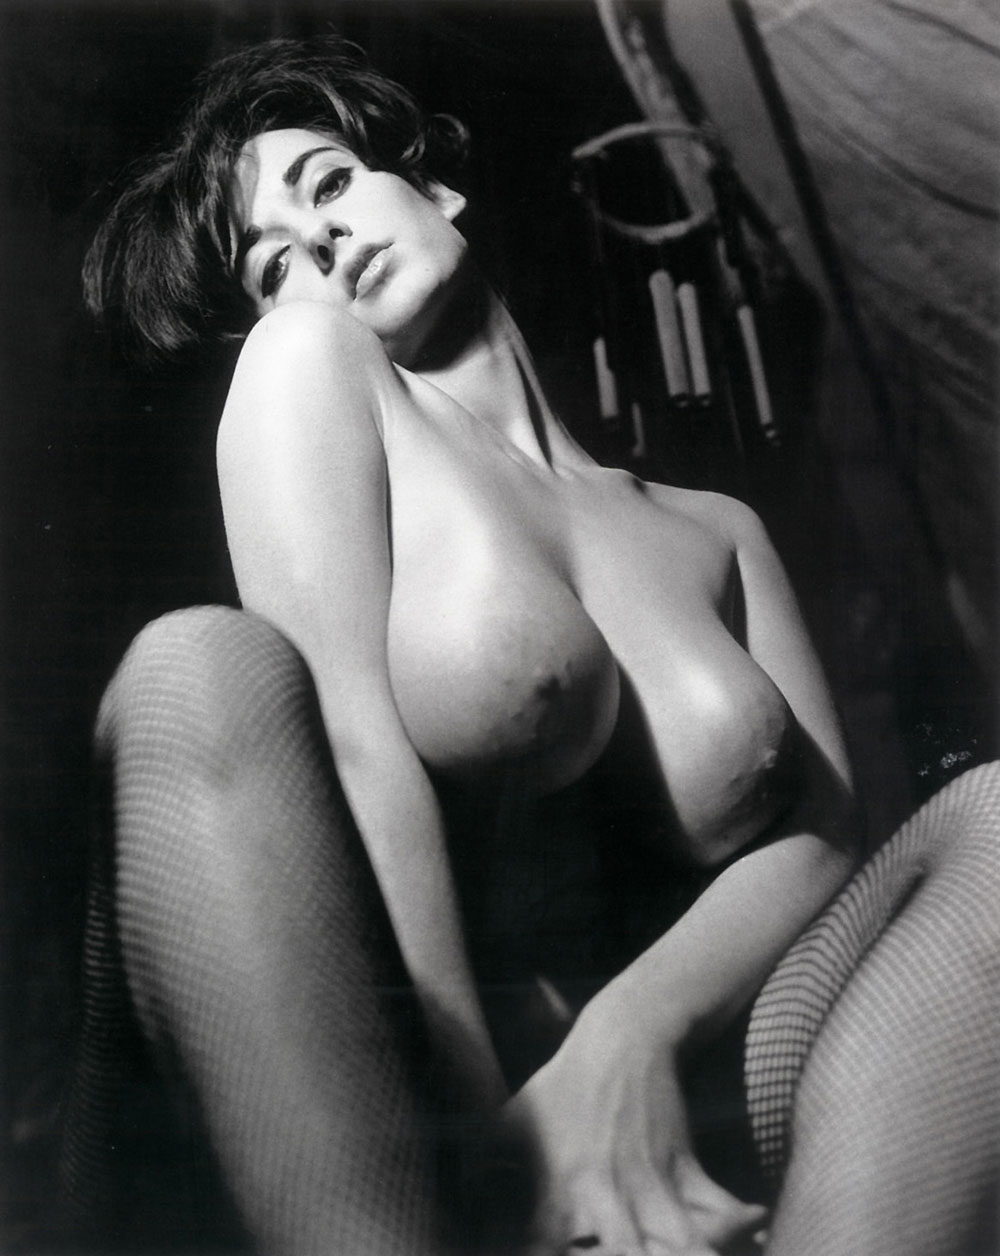 Порнозвезды 20 века